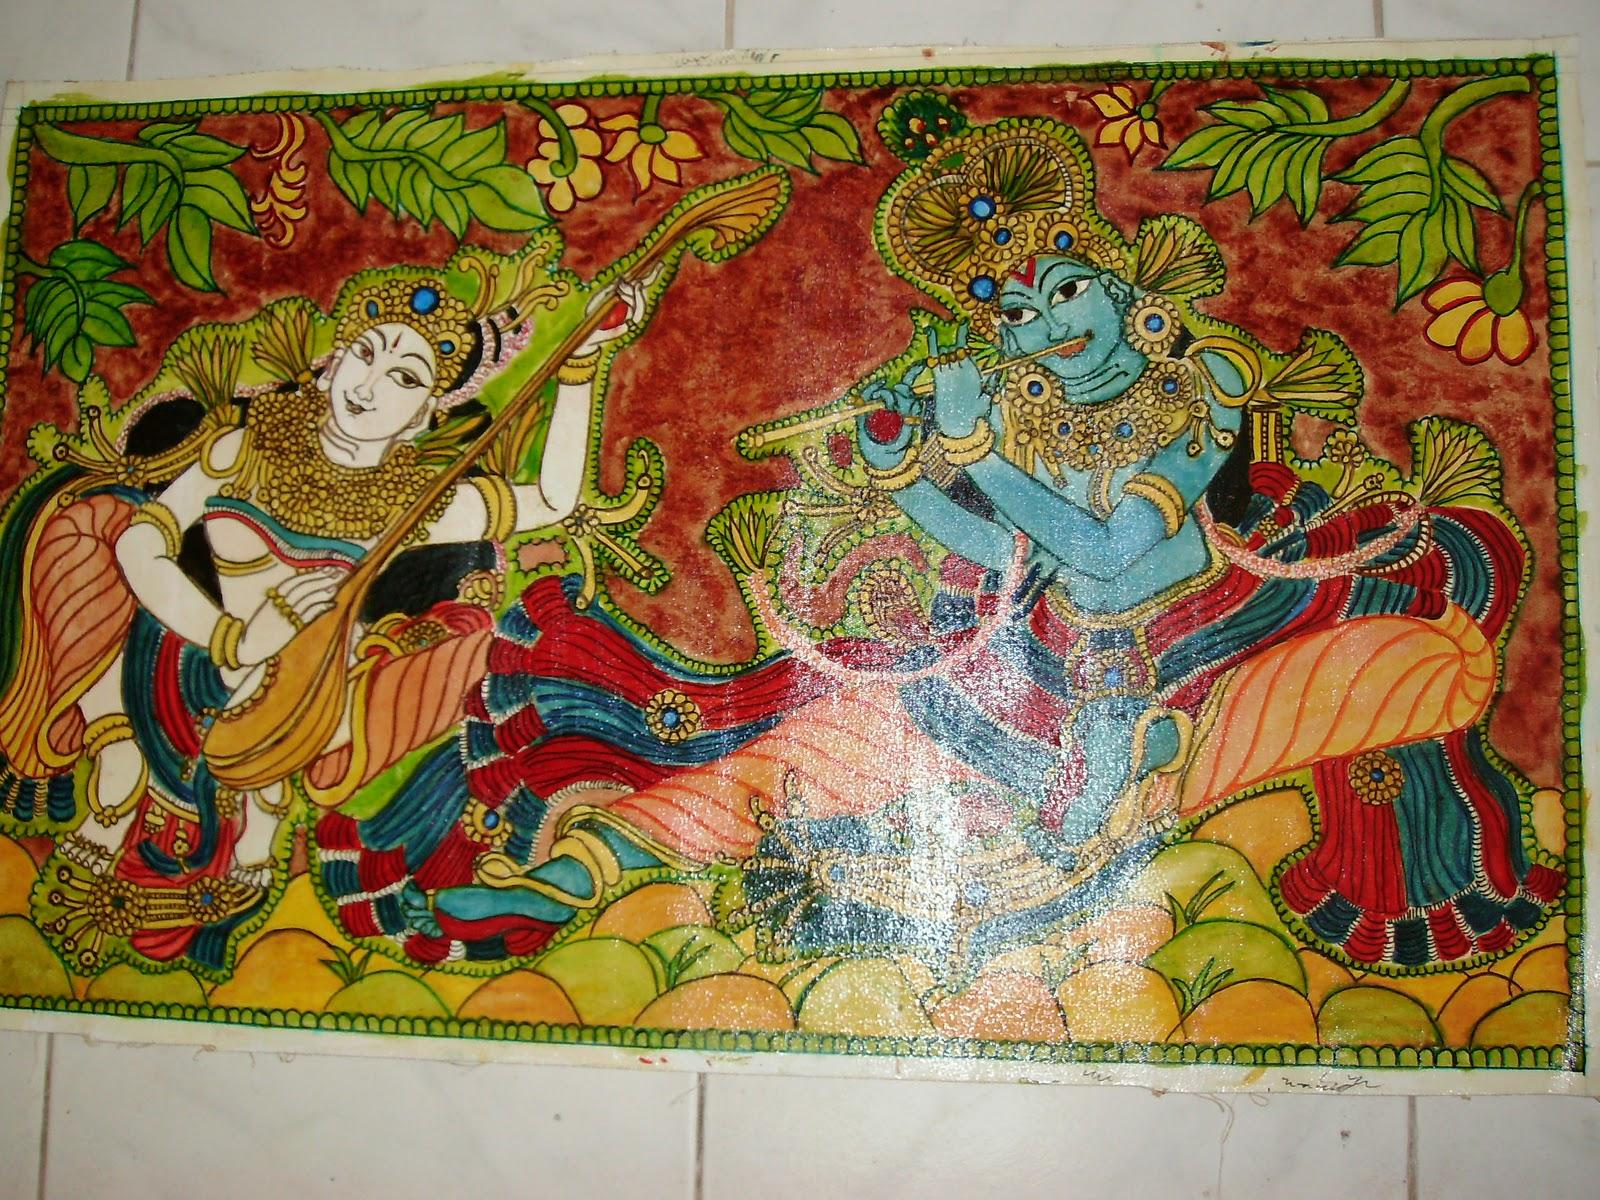 Usha srikumar 39 s musings kerala mural radha krishna for Mural radha krishna